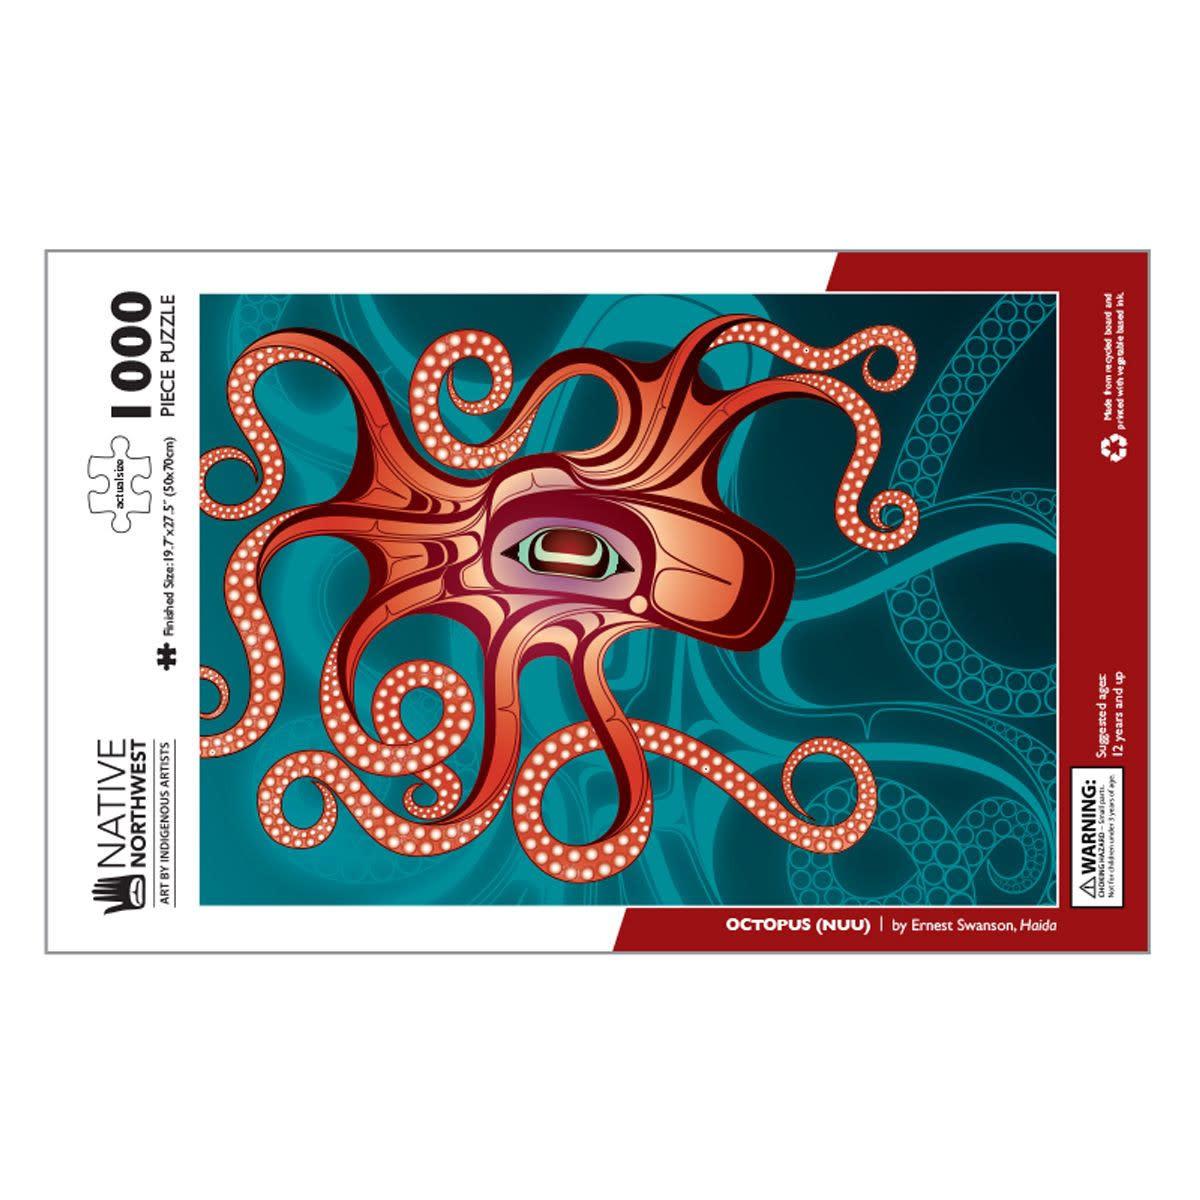 1000 pcs Puzzle- Octopus (Nuu) by Earnest Swanson-1